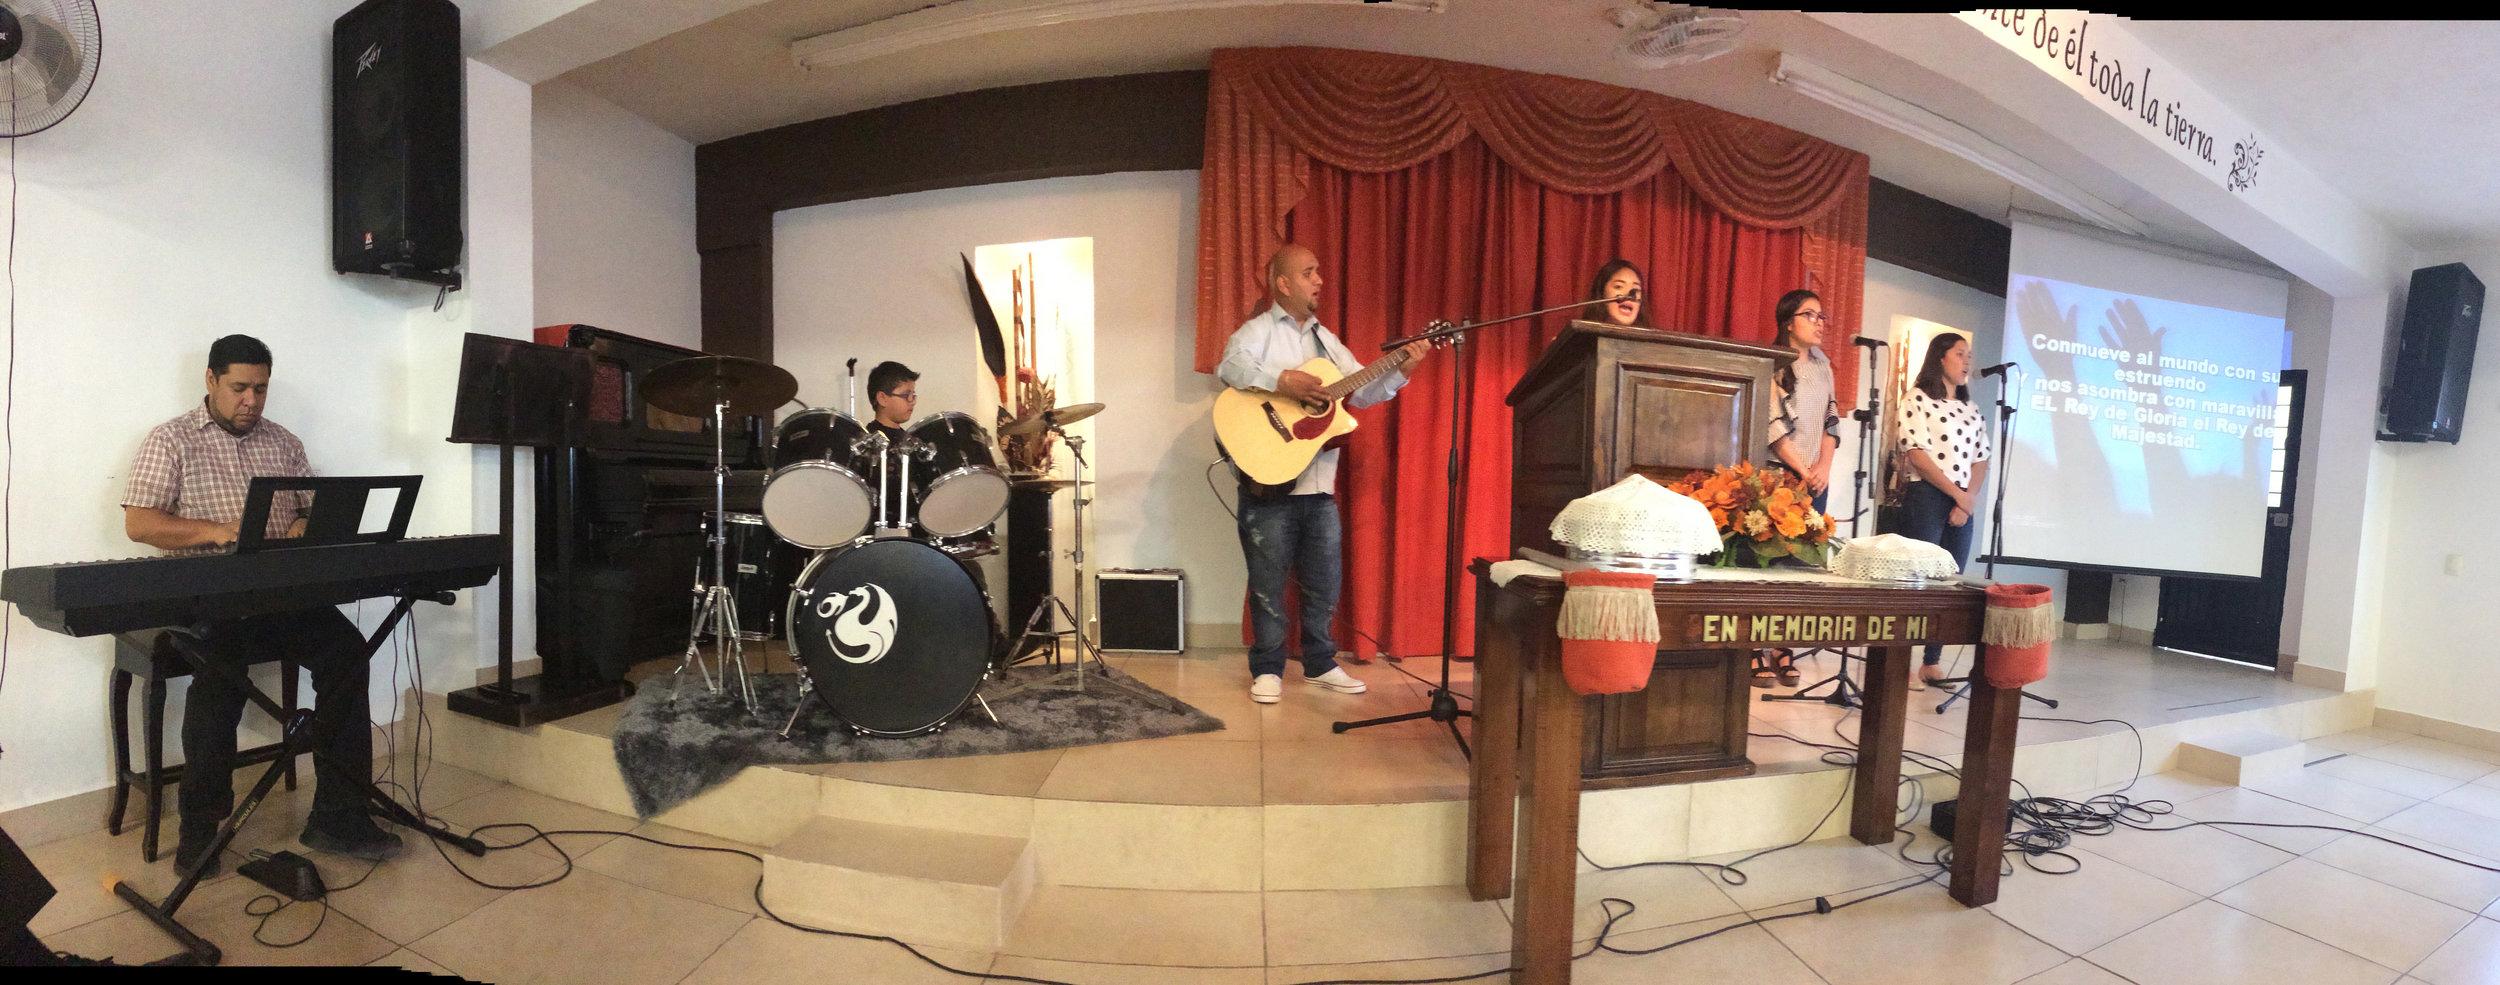 Plainfield-Christian-Church-Global-Impact-Croc-Church-Worship.jpg